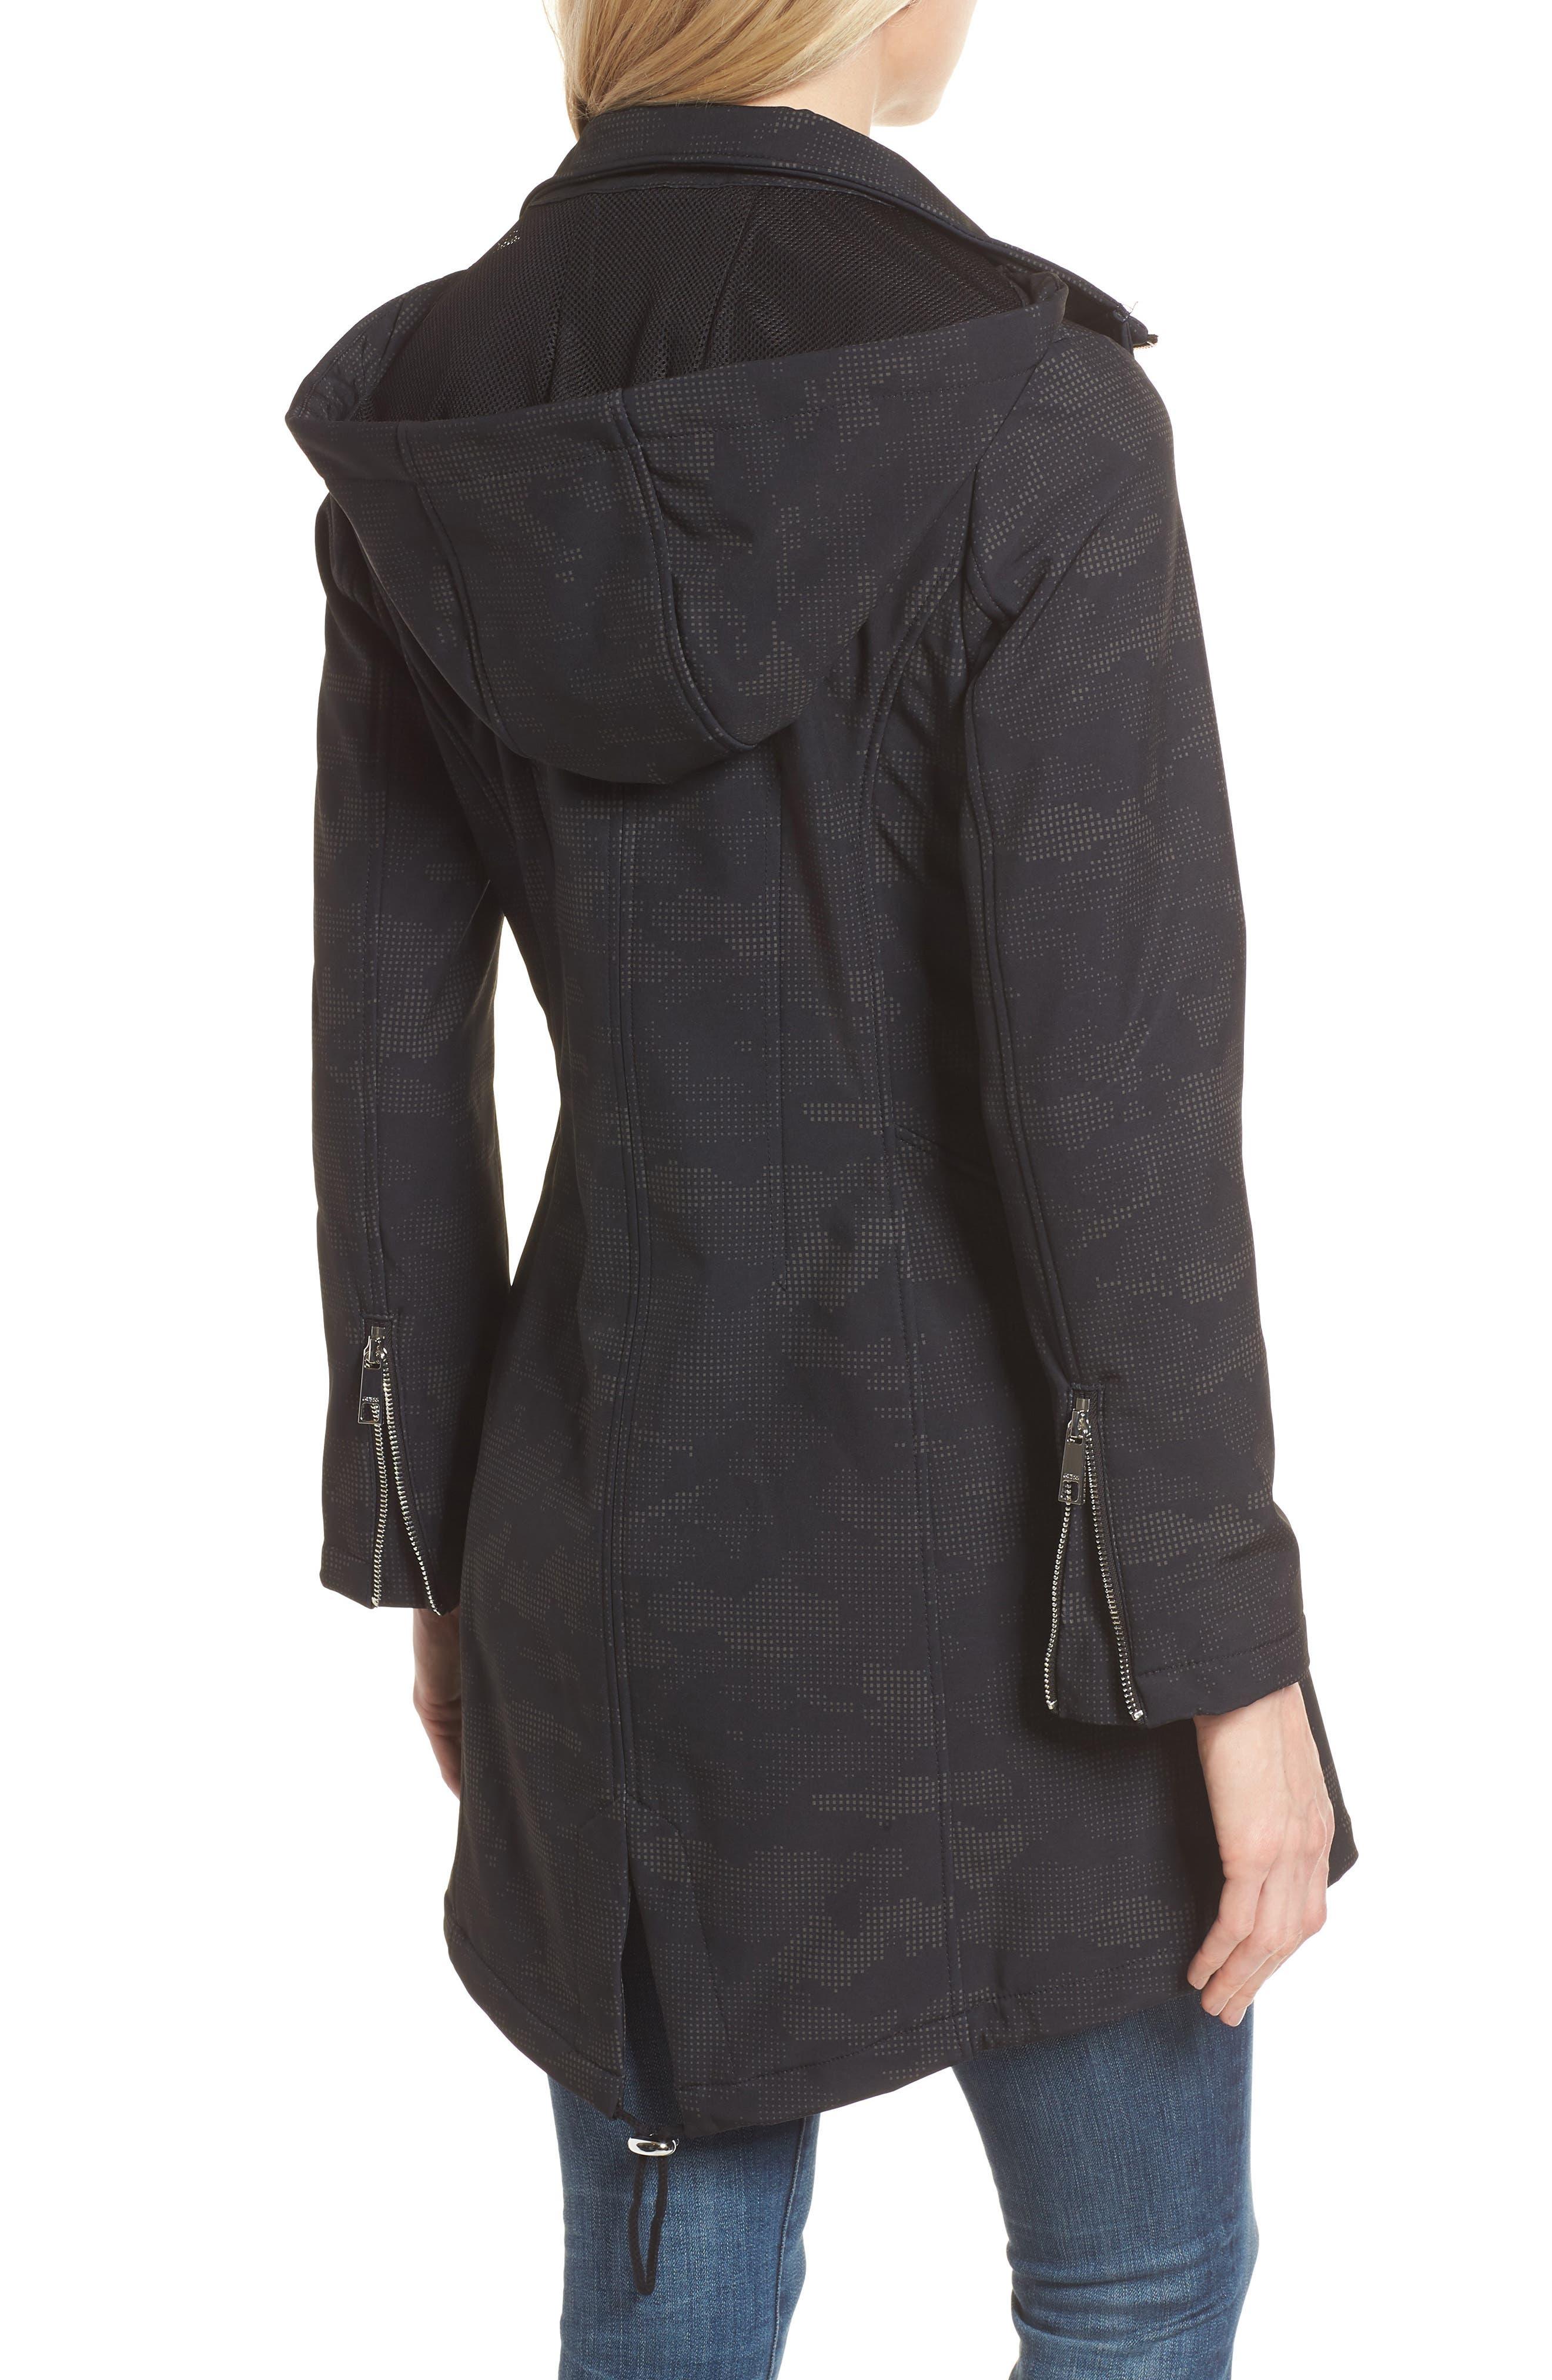 Lace-Up Hooded Jacket,                             Alternate thumbnail 2, color,                             Black Print